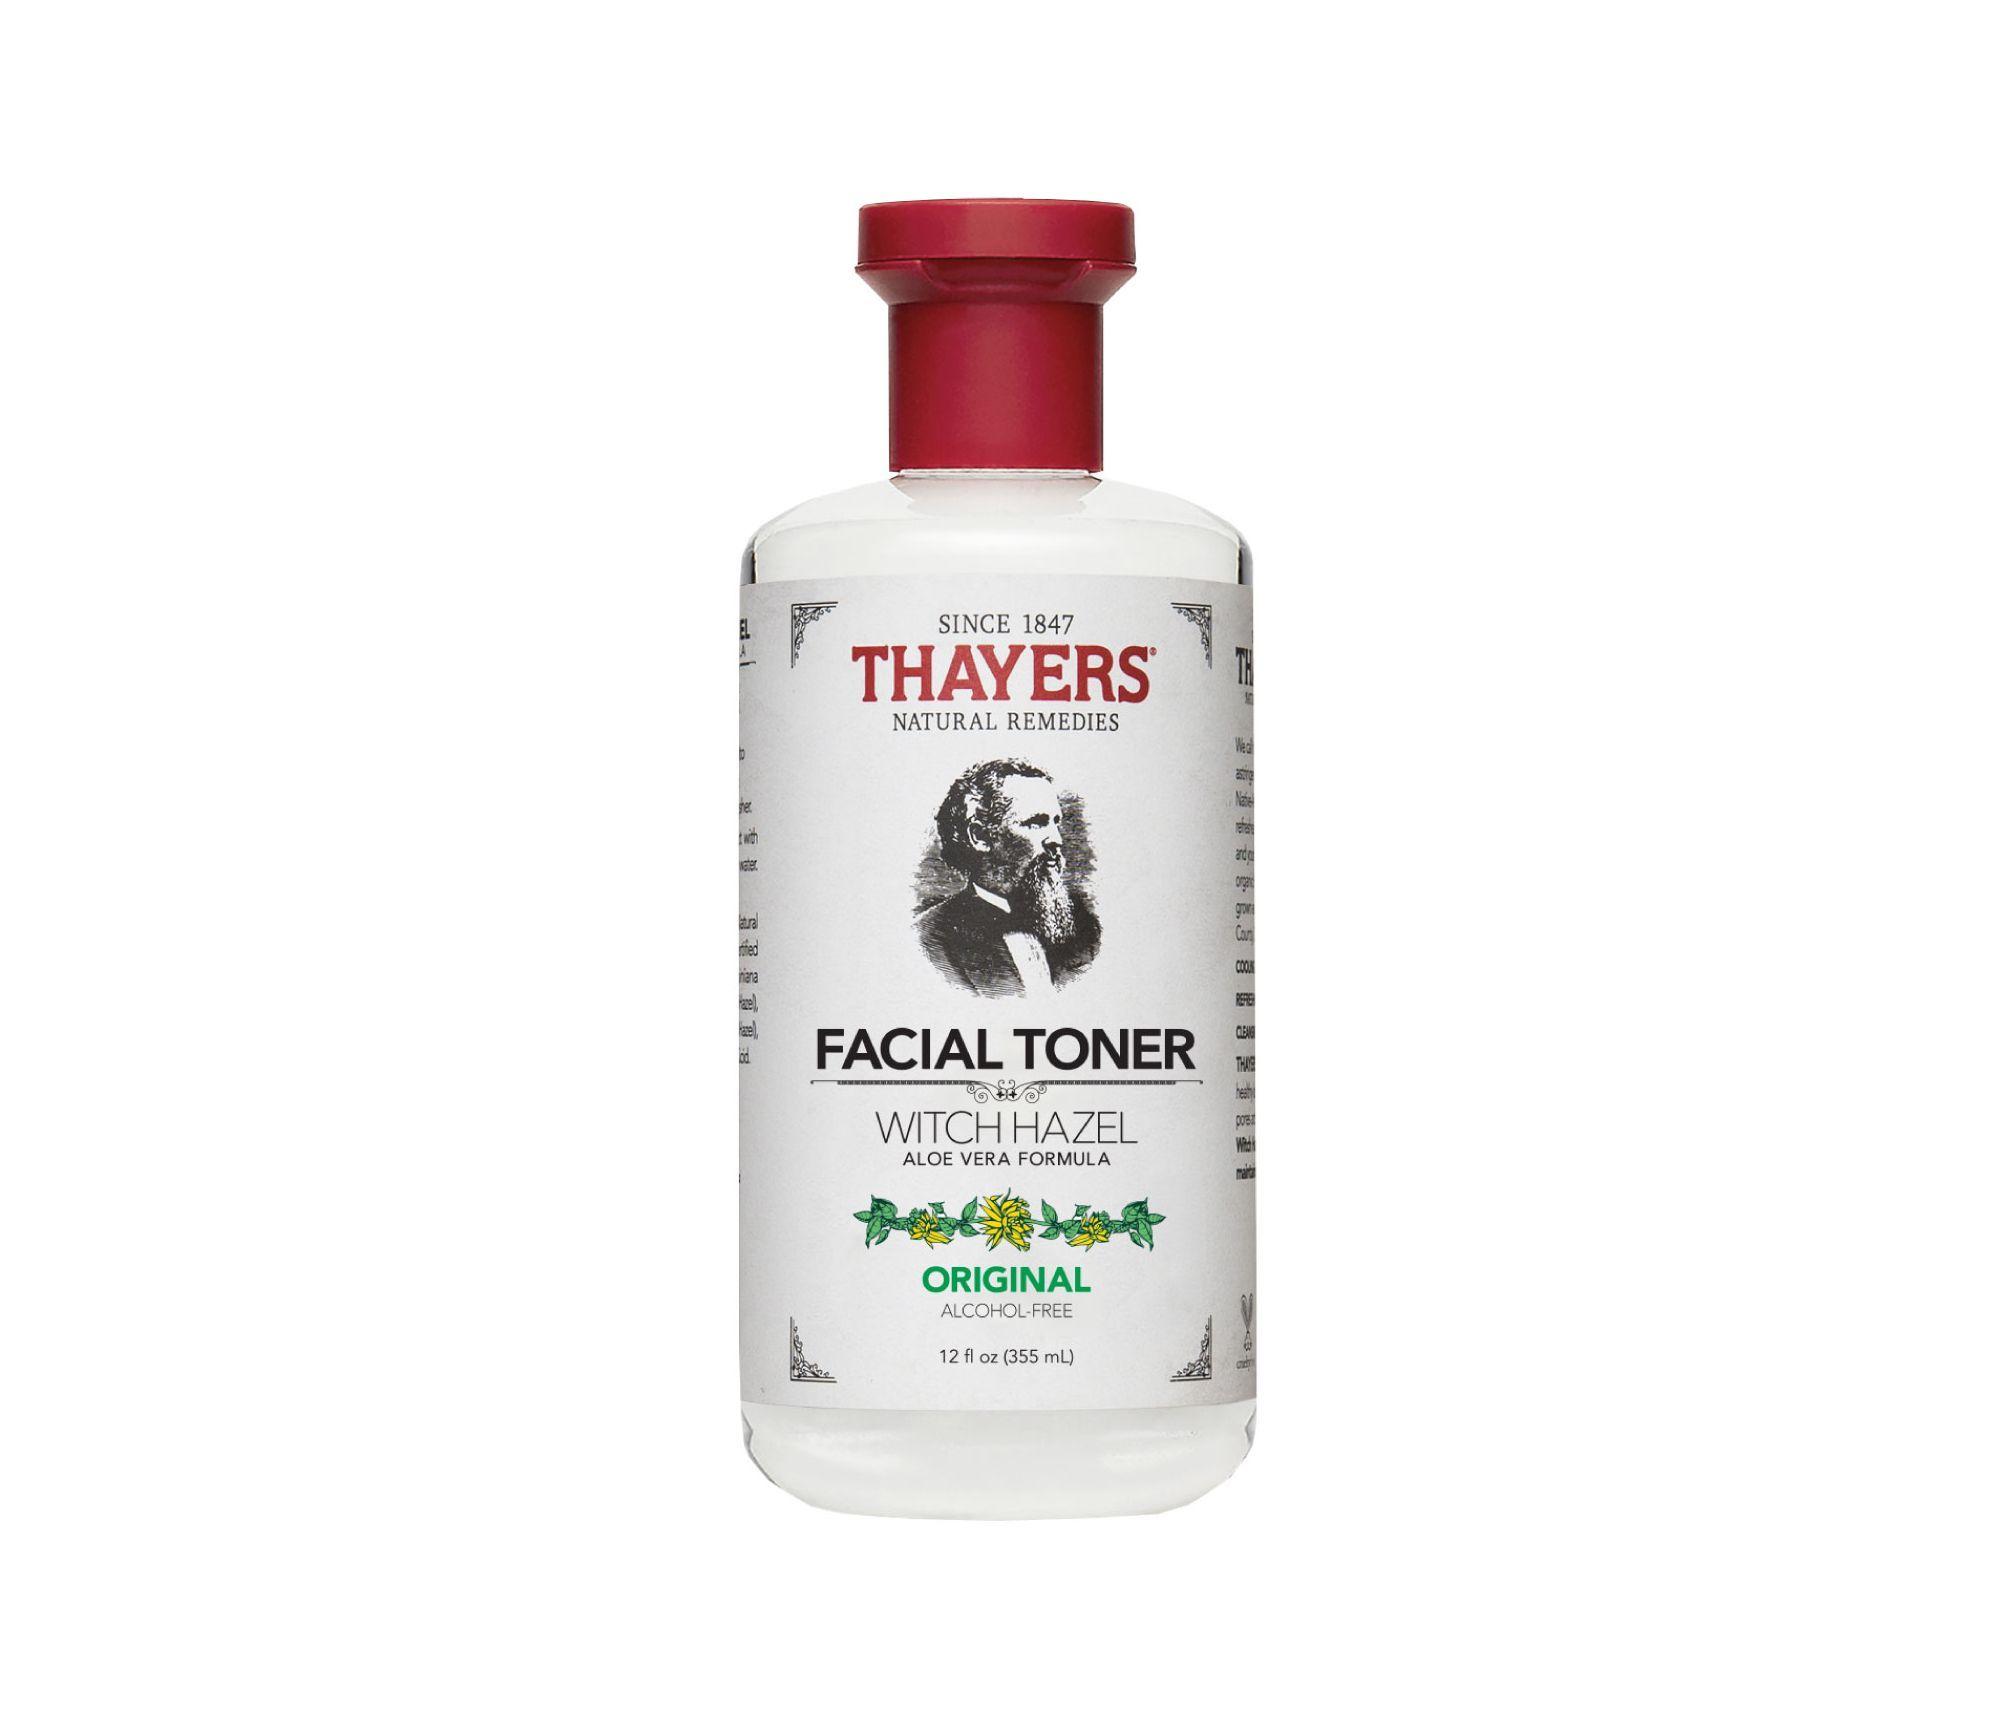 Image result for facial toner